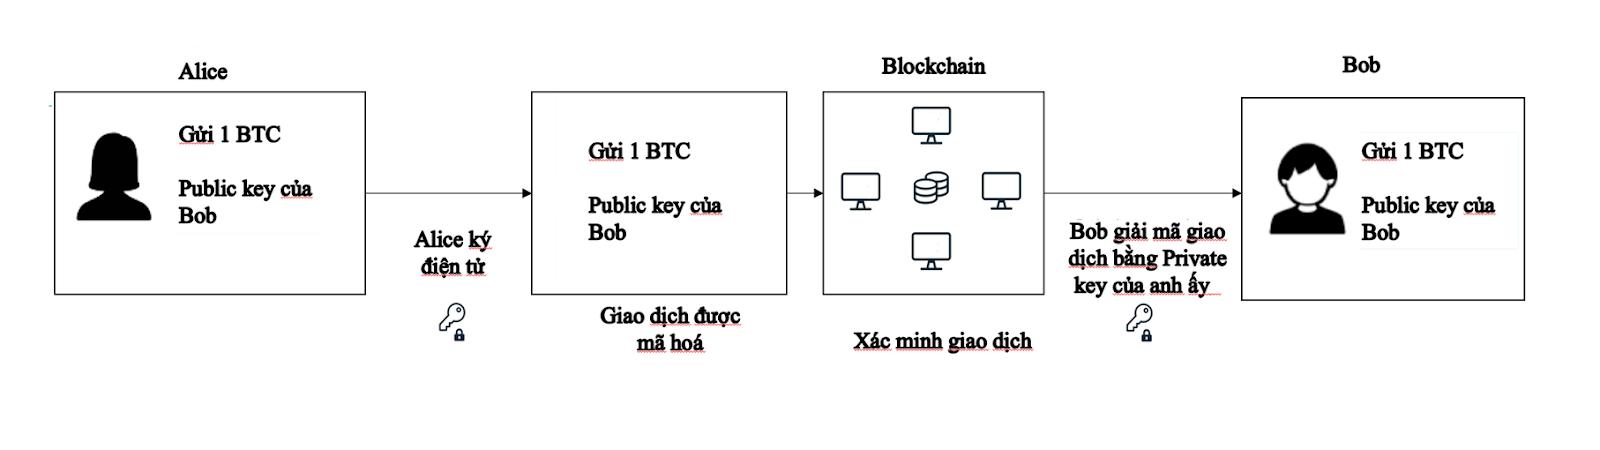 public key và private key